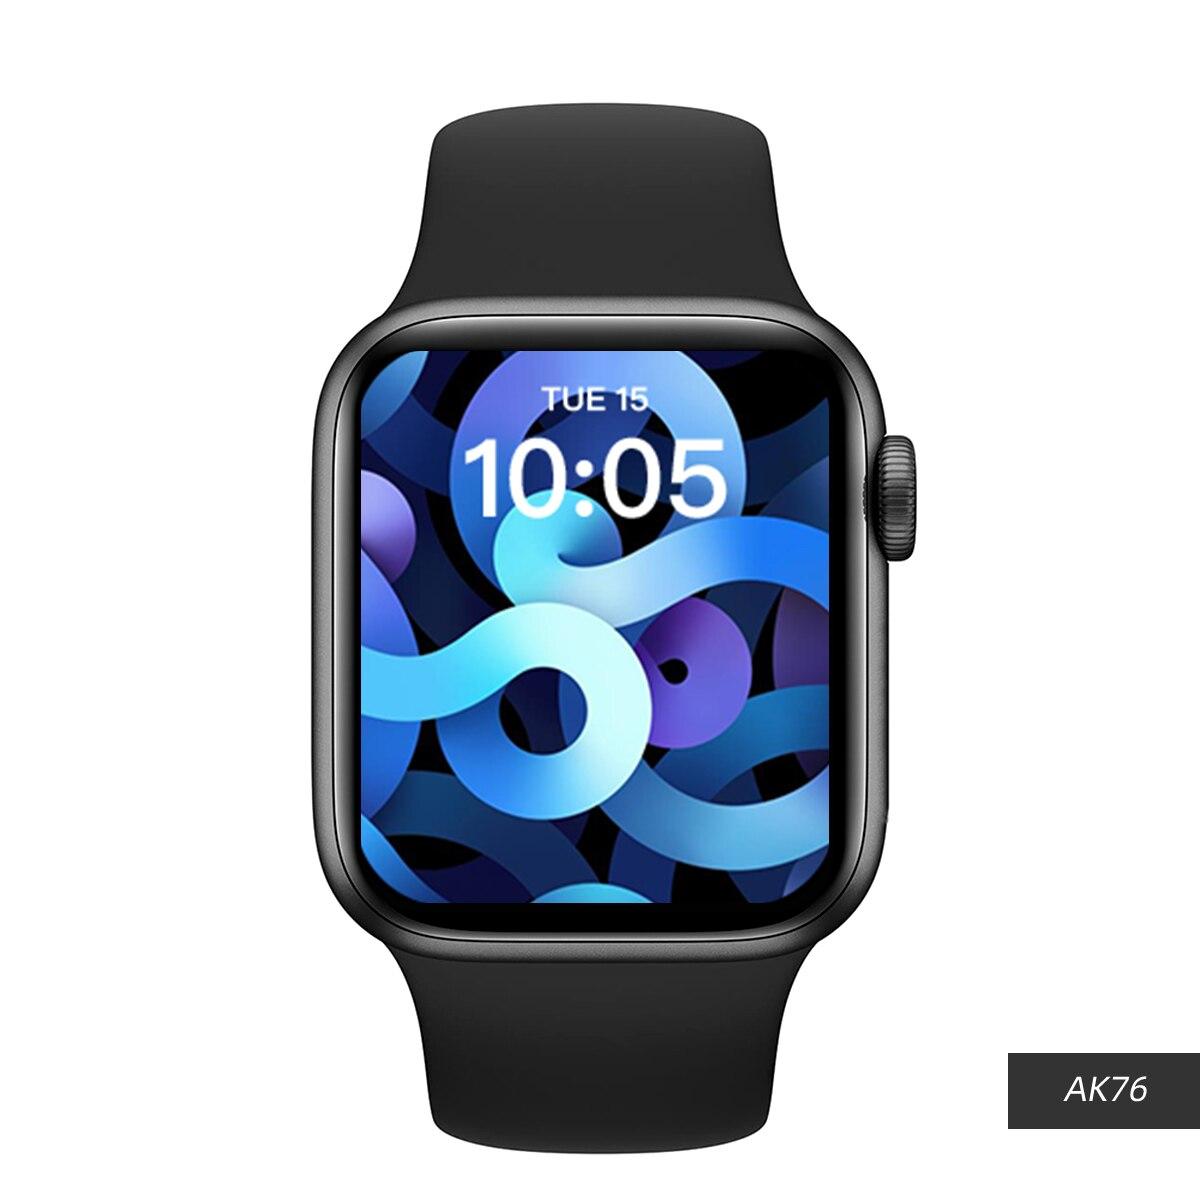 HW22 زائد ساعة ذكية النساء الرجال AK76 ألعاب ساعة 44 مللي متر HW33 Smartwatch بلوتوث دعوة HW16 معدل ضربات القلب 1.75 بوصة ل IOS أندرويد